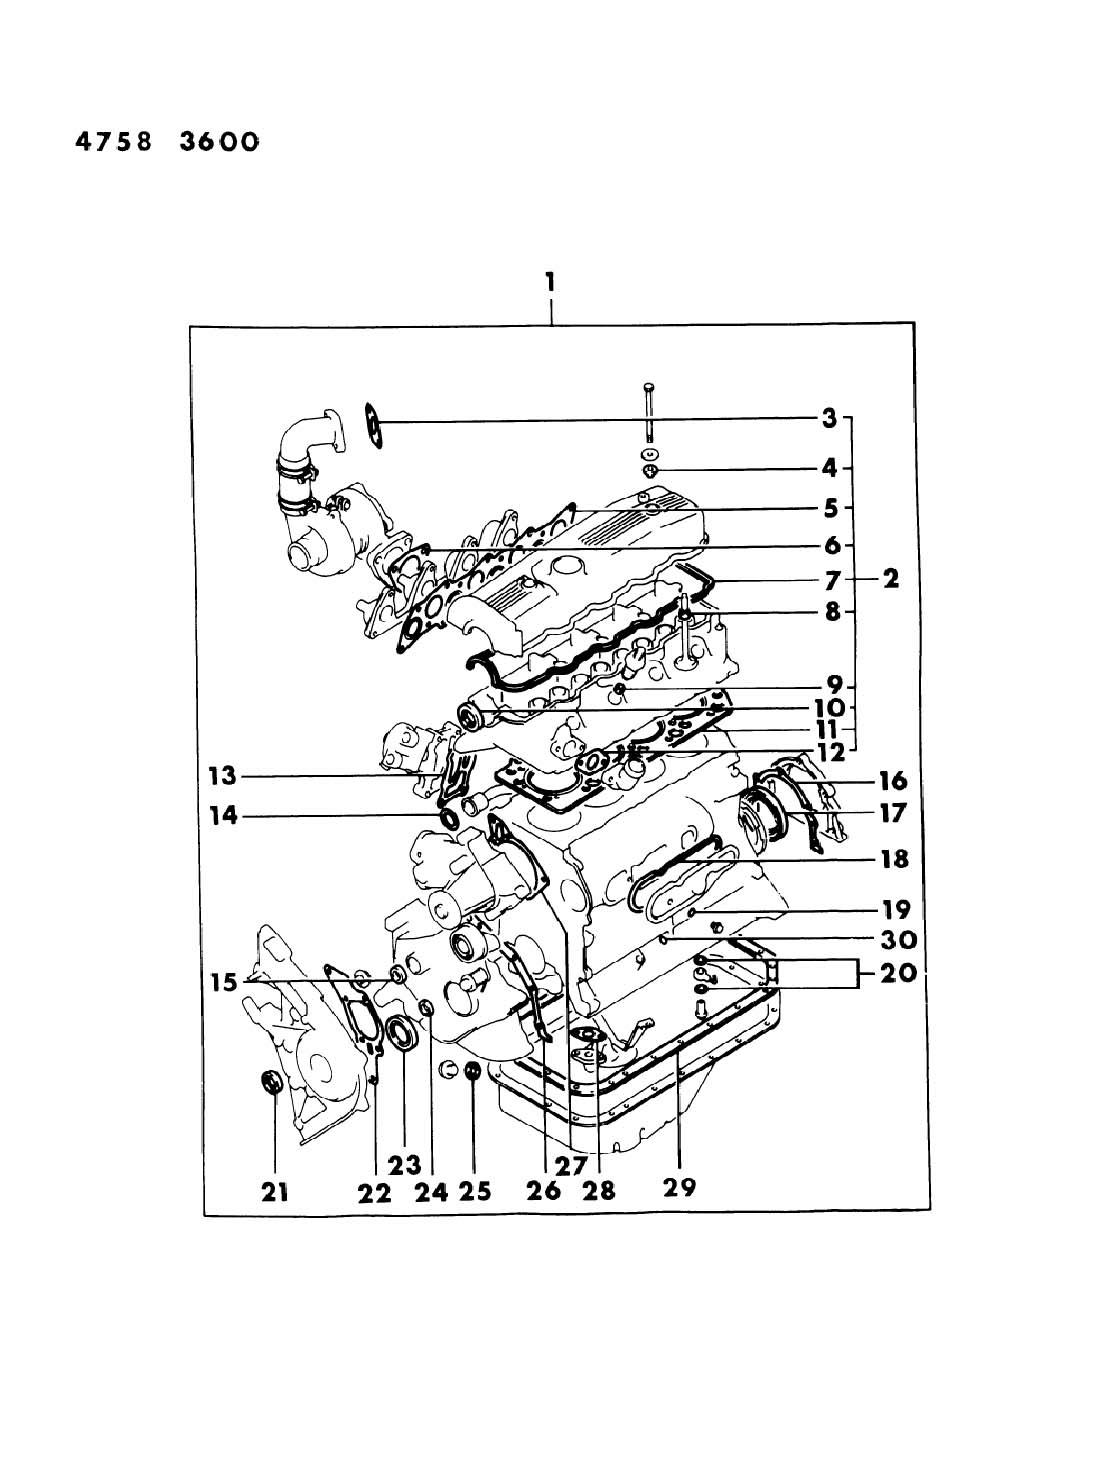 1998 Chrysler Sebring Oil seal. Crankshaft. Engine, filter